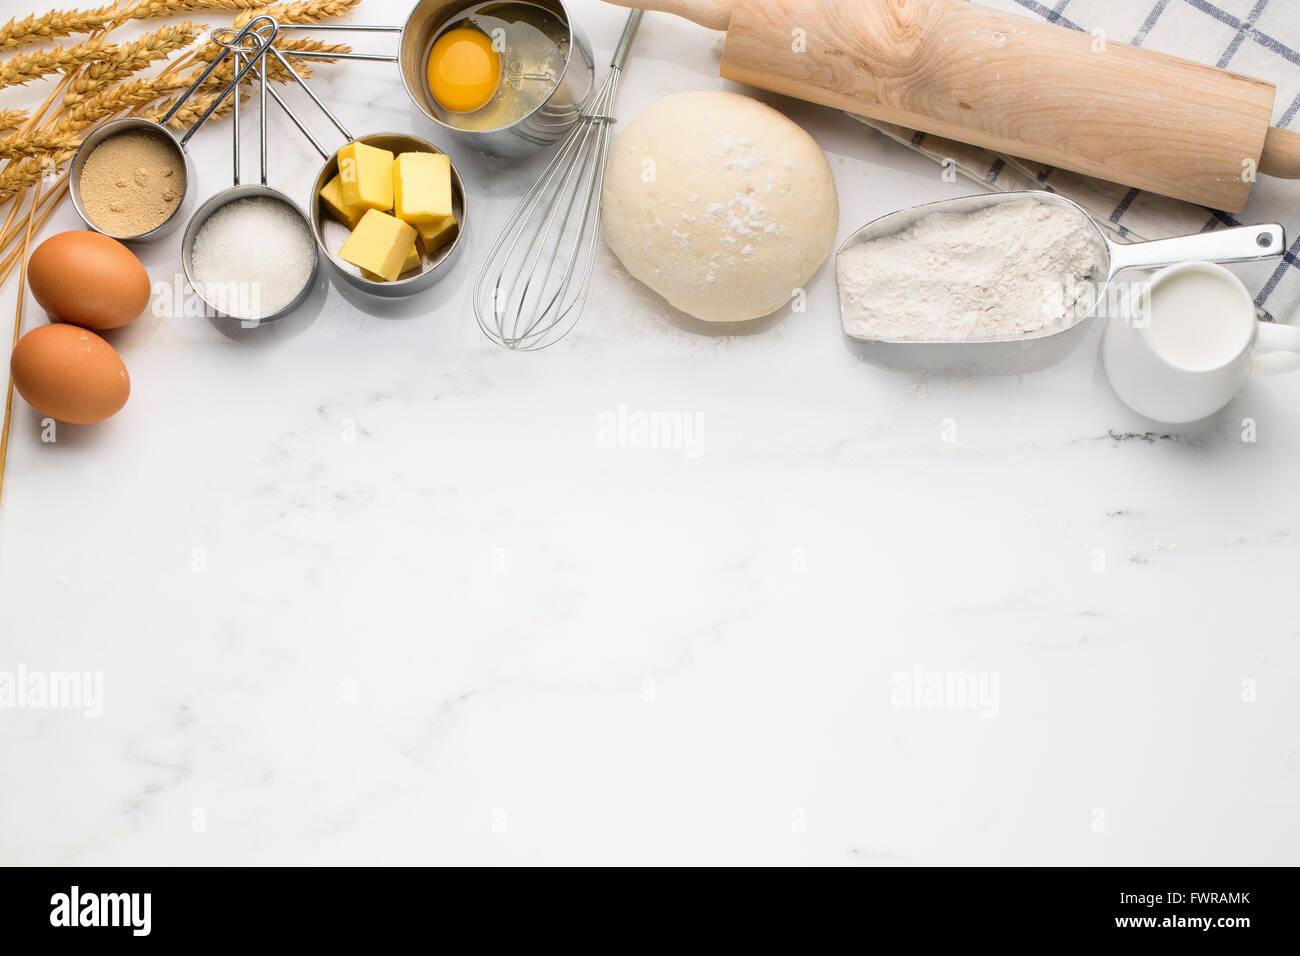 Baking cake, dough recipe ingredients (eggs, flour, milk, butter, sugar) on white table. - Stock Image